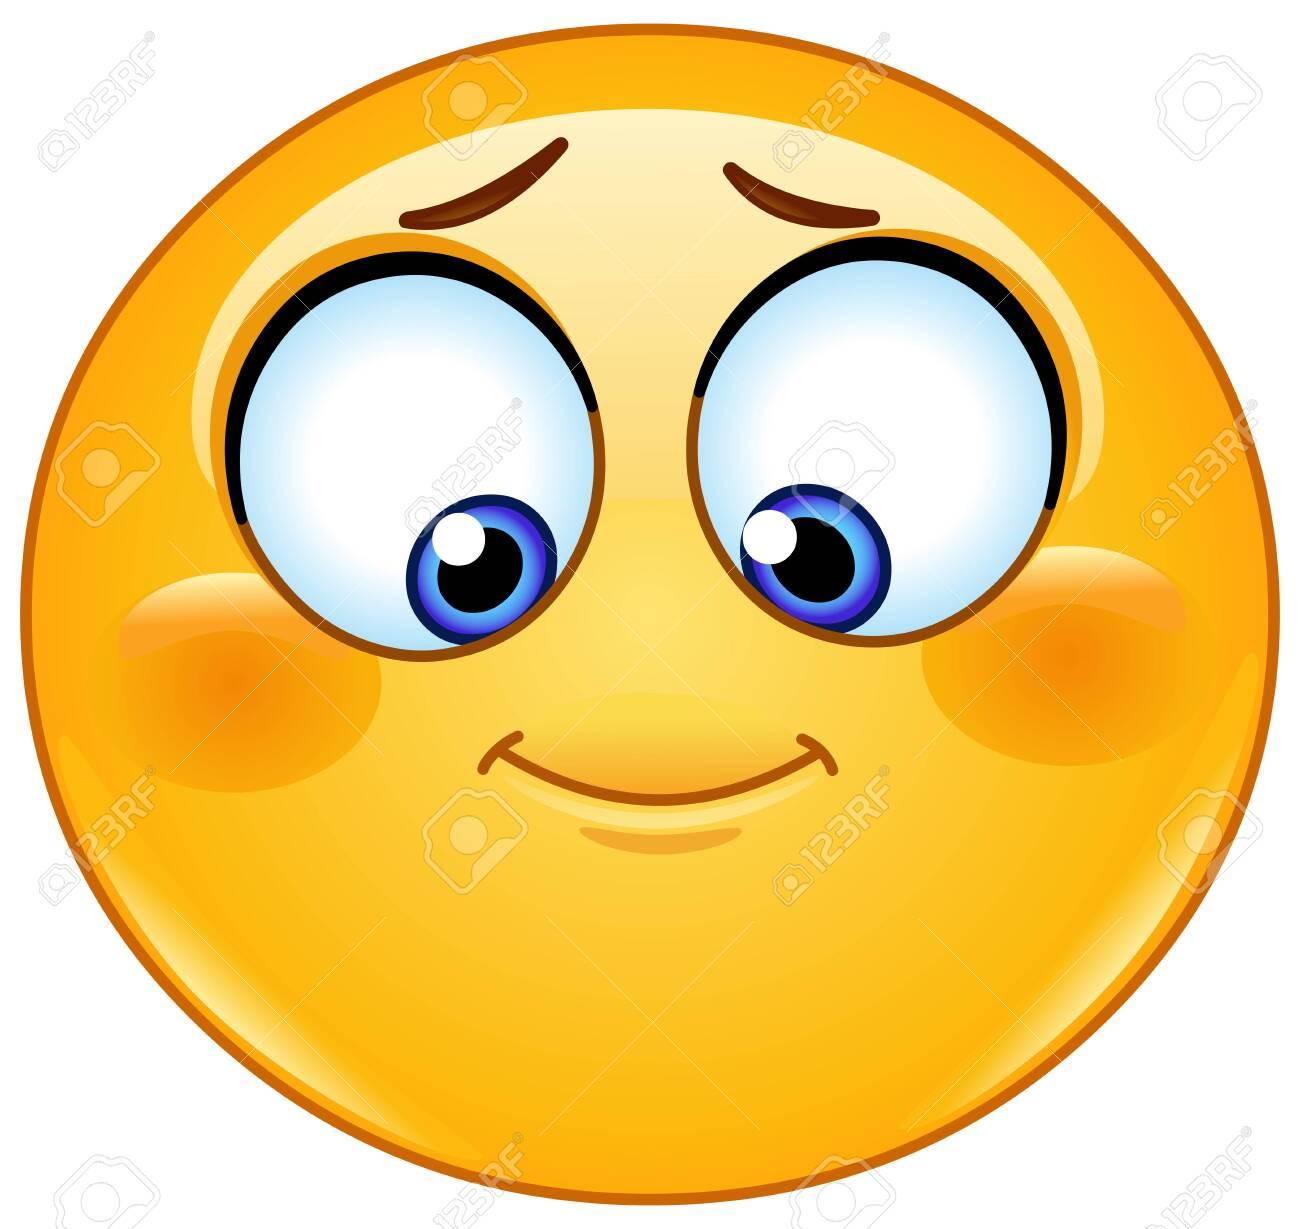 Shy emoji emoticon looking down - 138900512